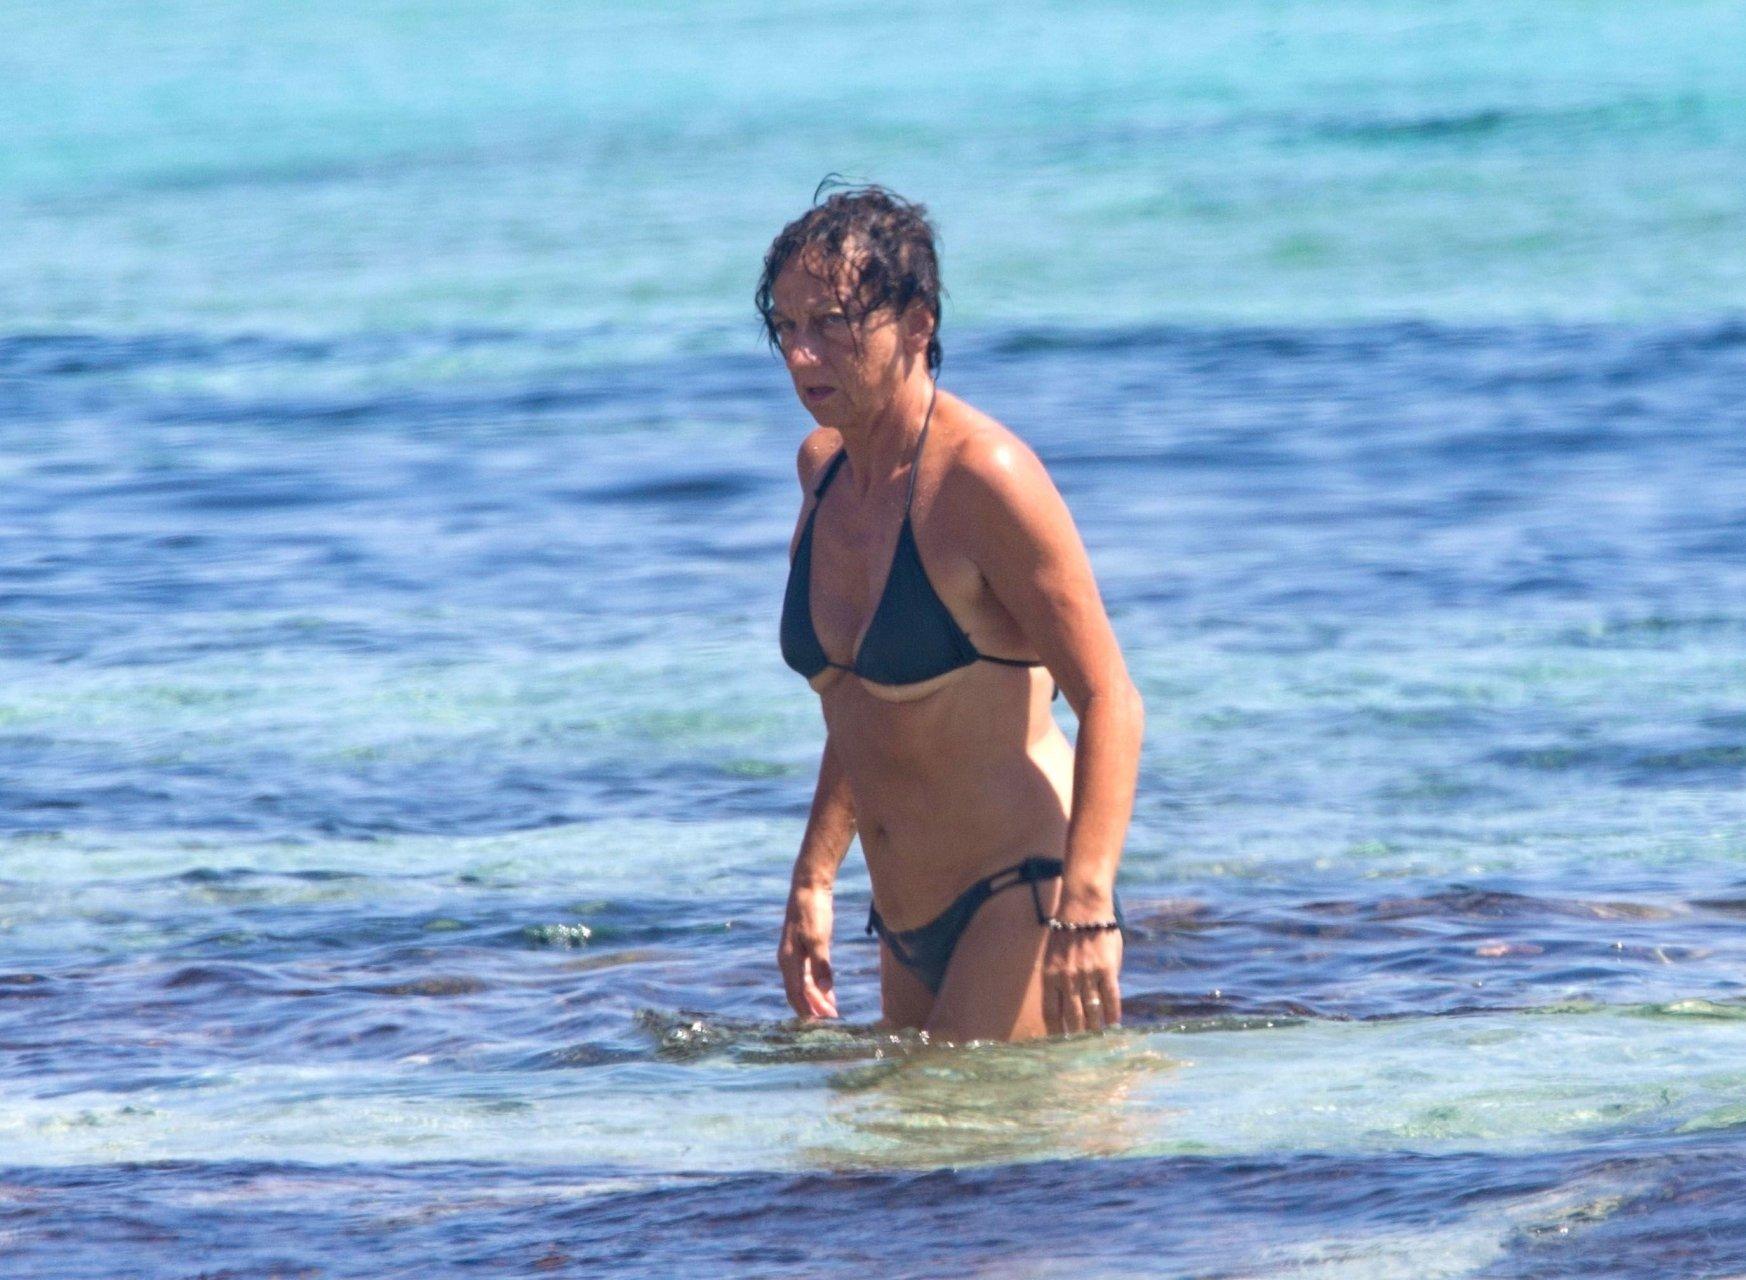 Fappening Gianna Nannini nudes (15 photos), Sexy, Paparazzi, Selfie, bra 2020